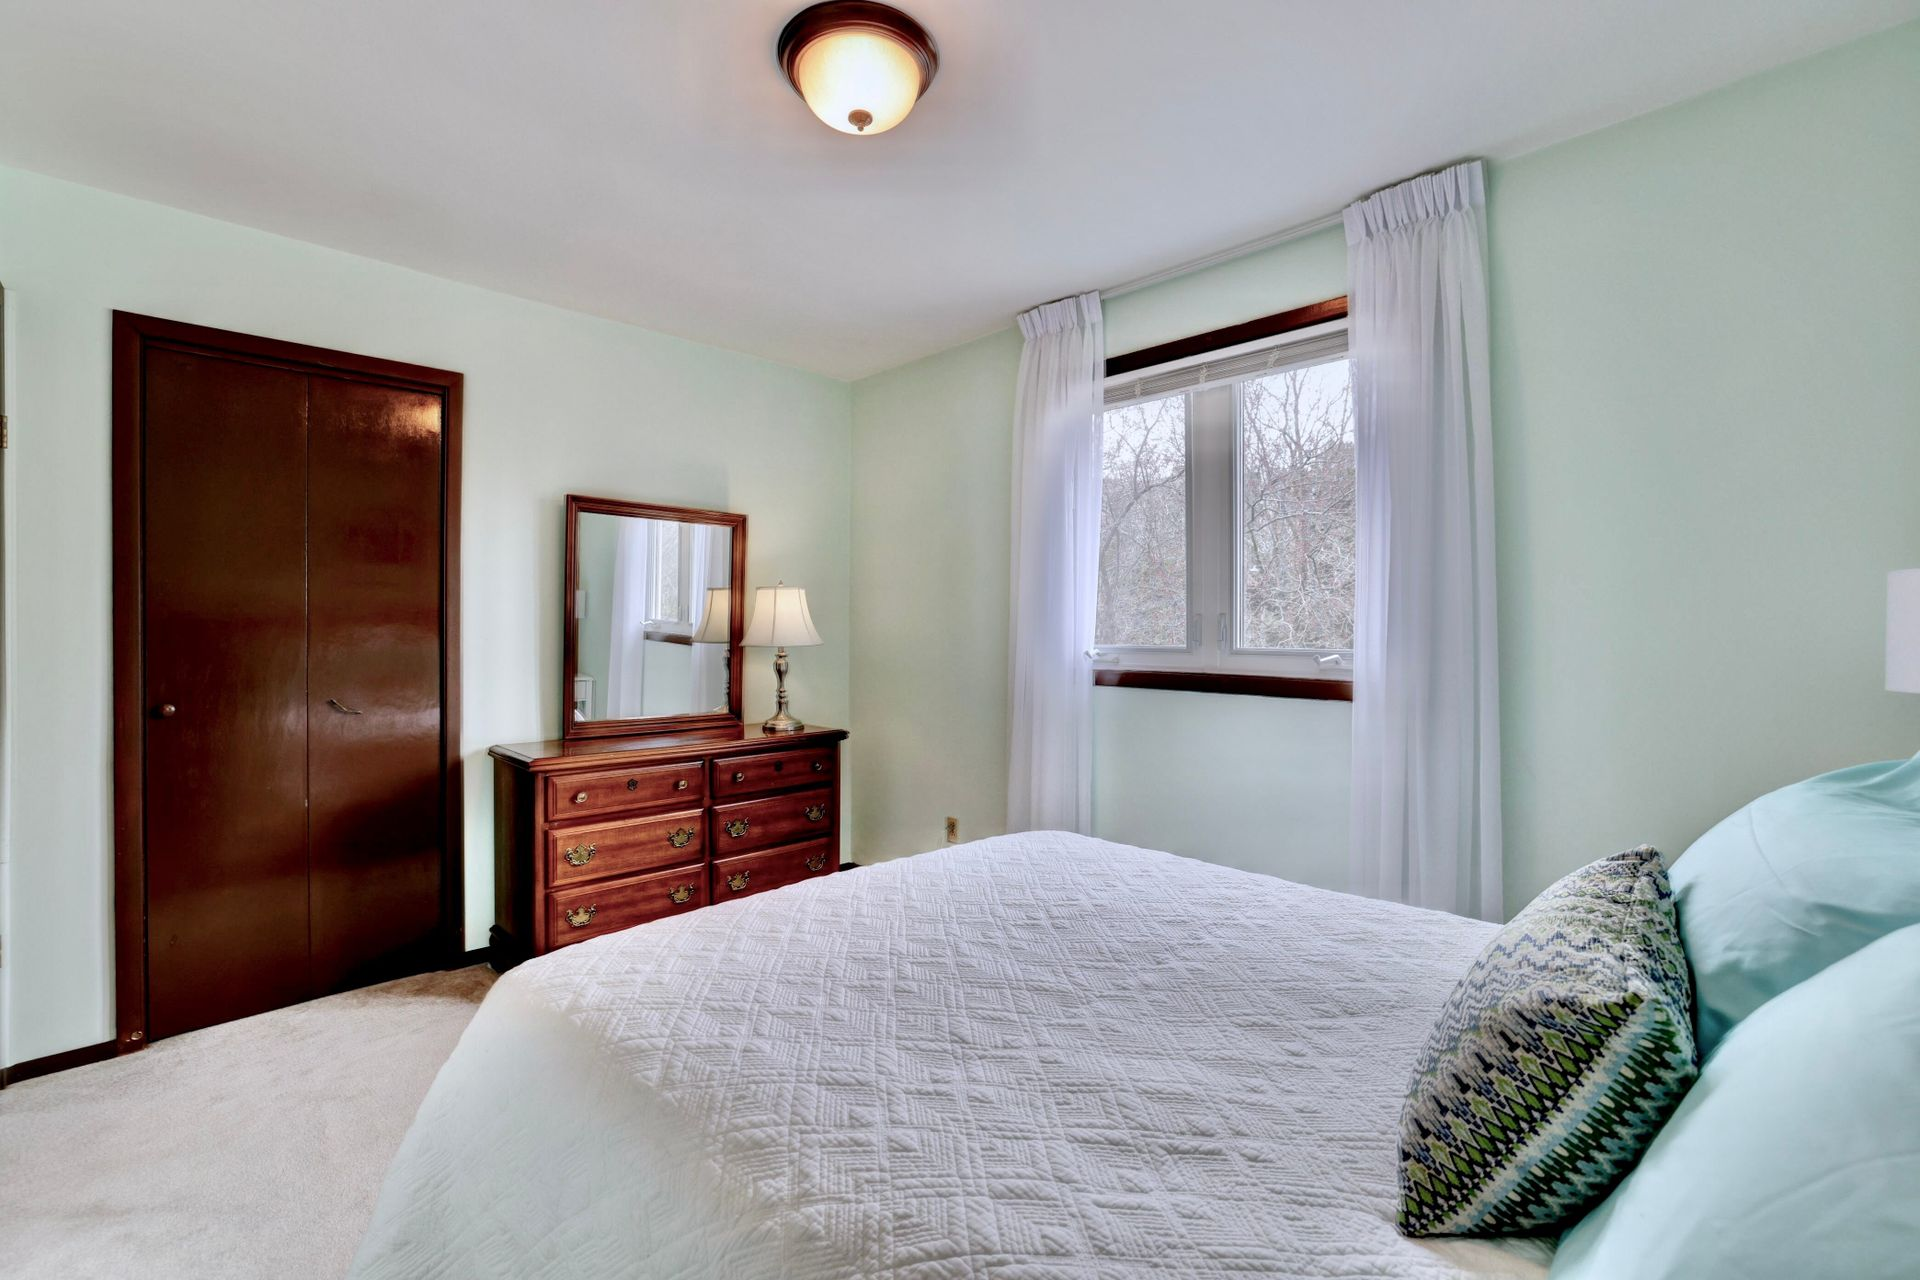 101-solingate-dr-oakville-bedroom2-window at 101 Solingate Drive, Bronte West, Oakville